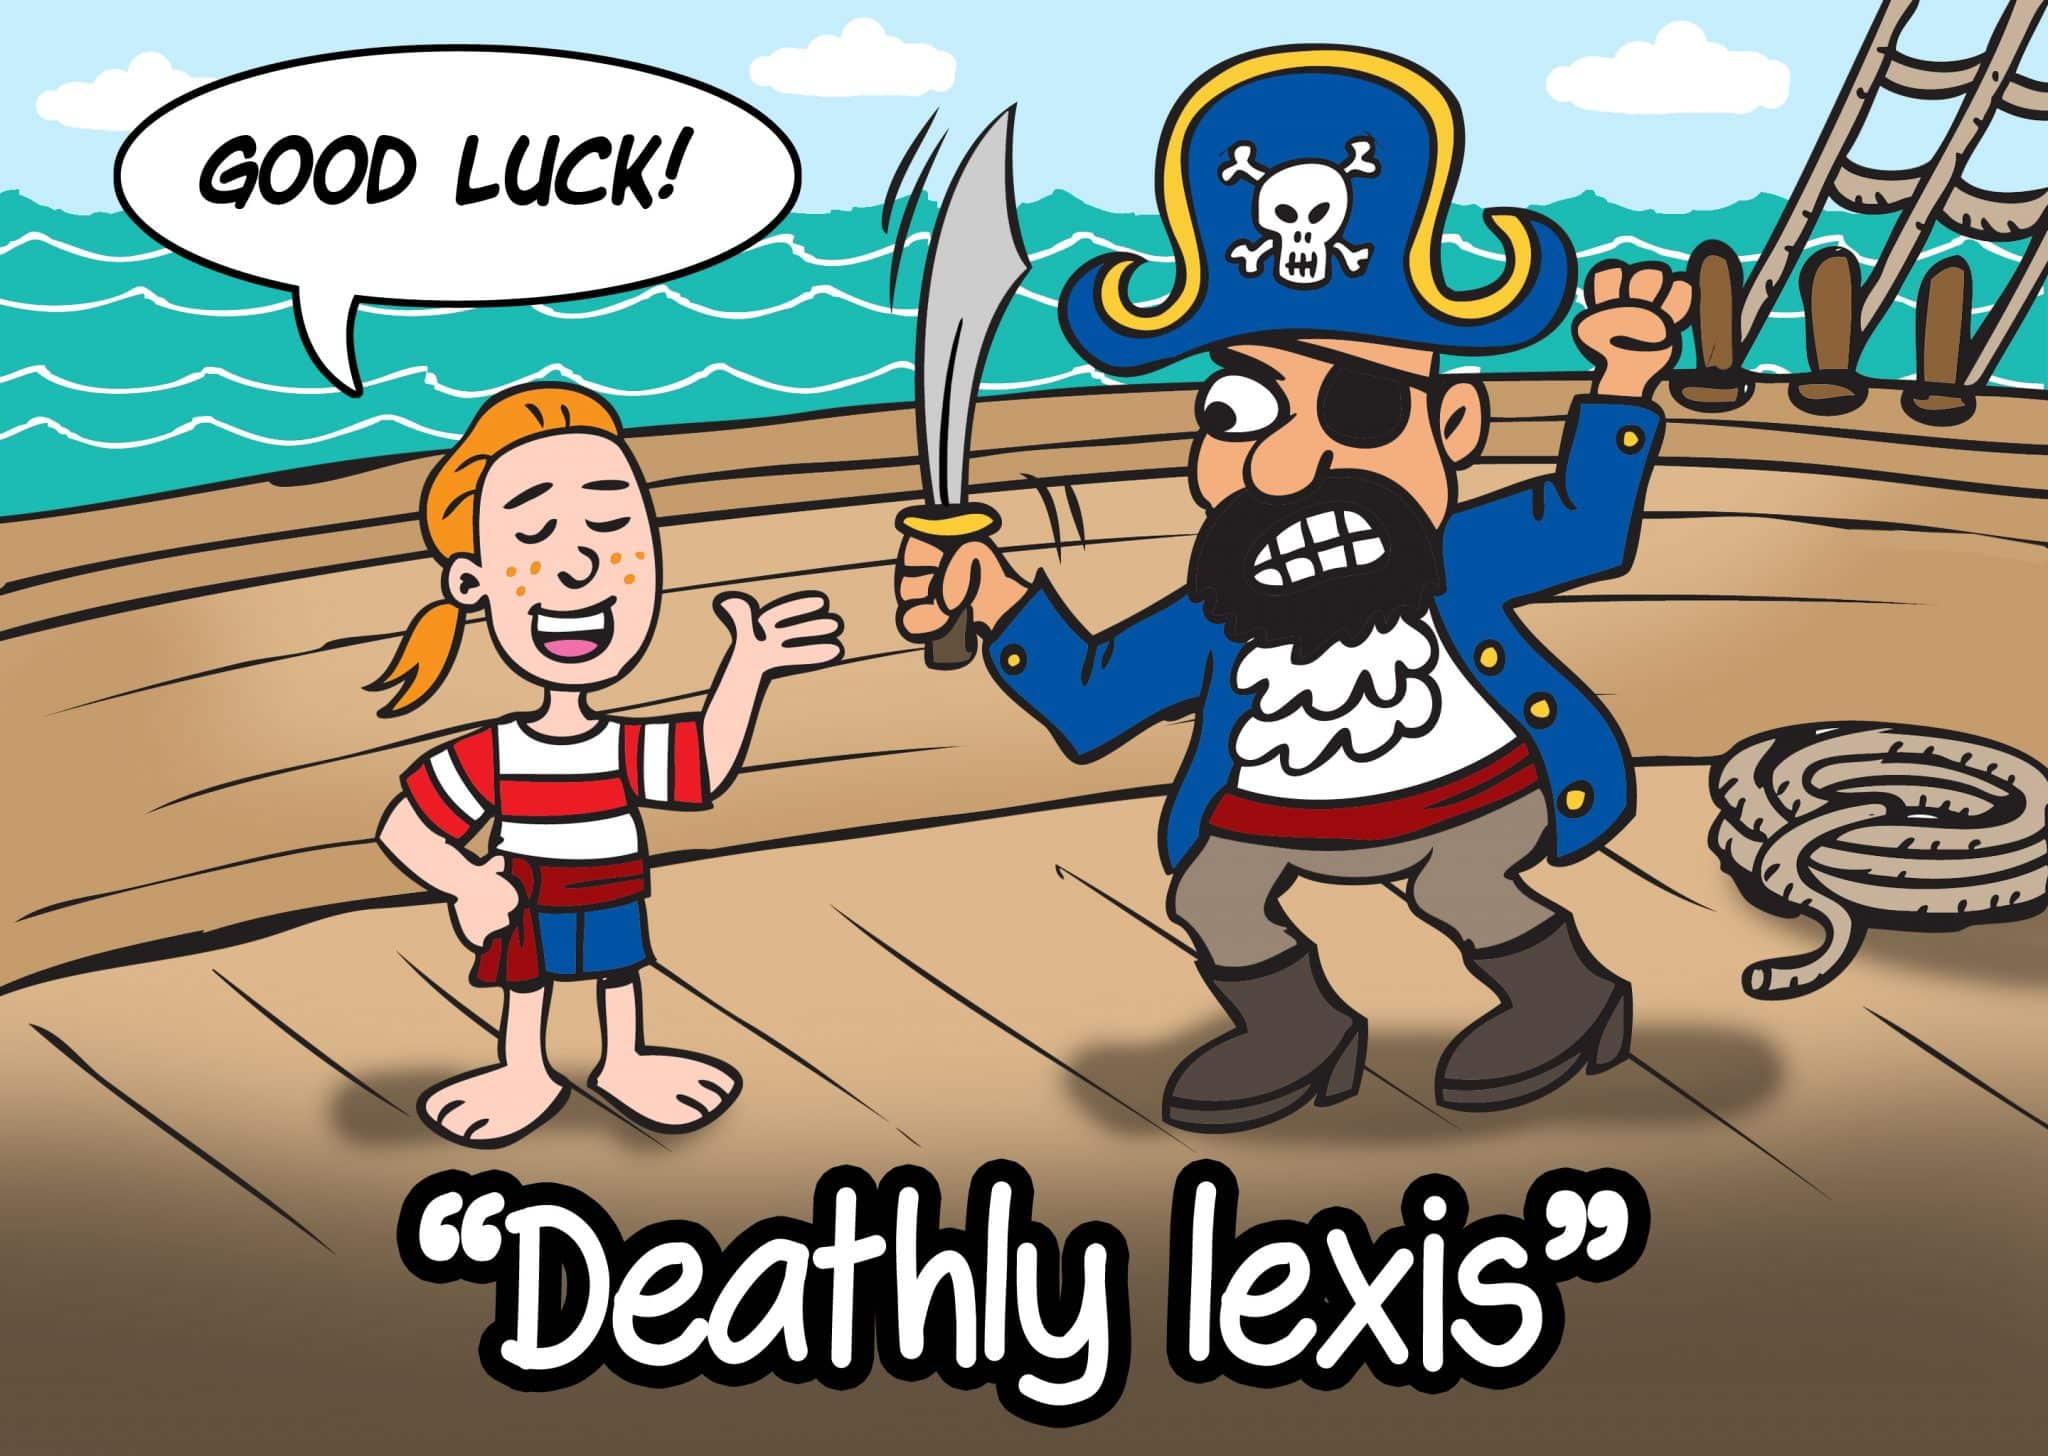 deathly-lexis